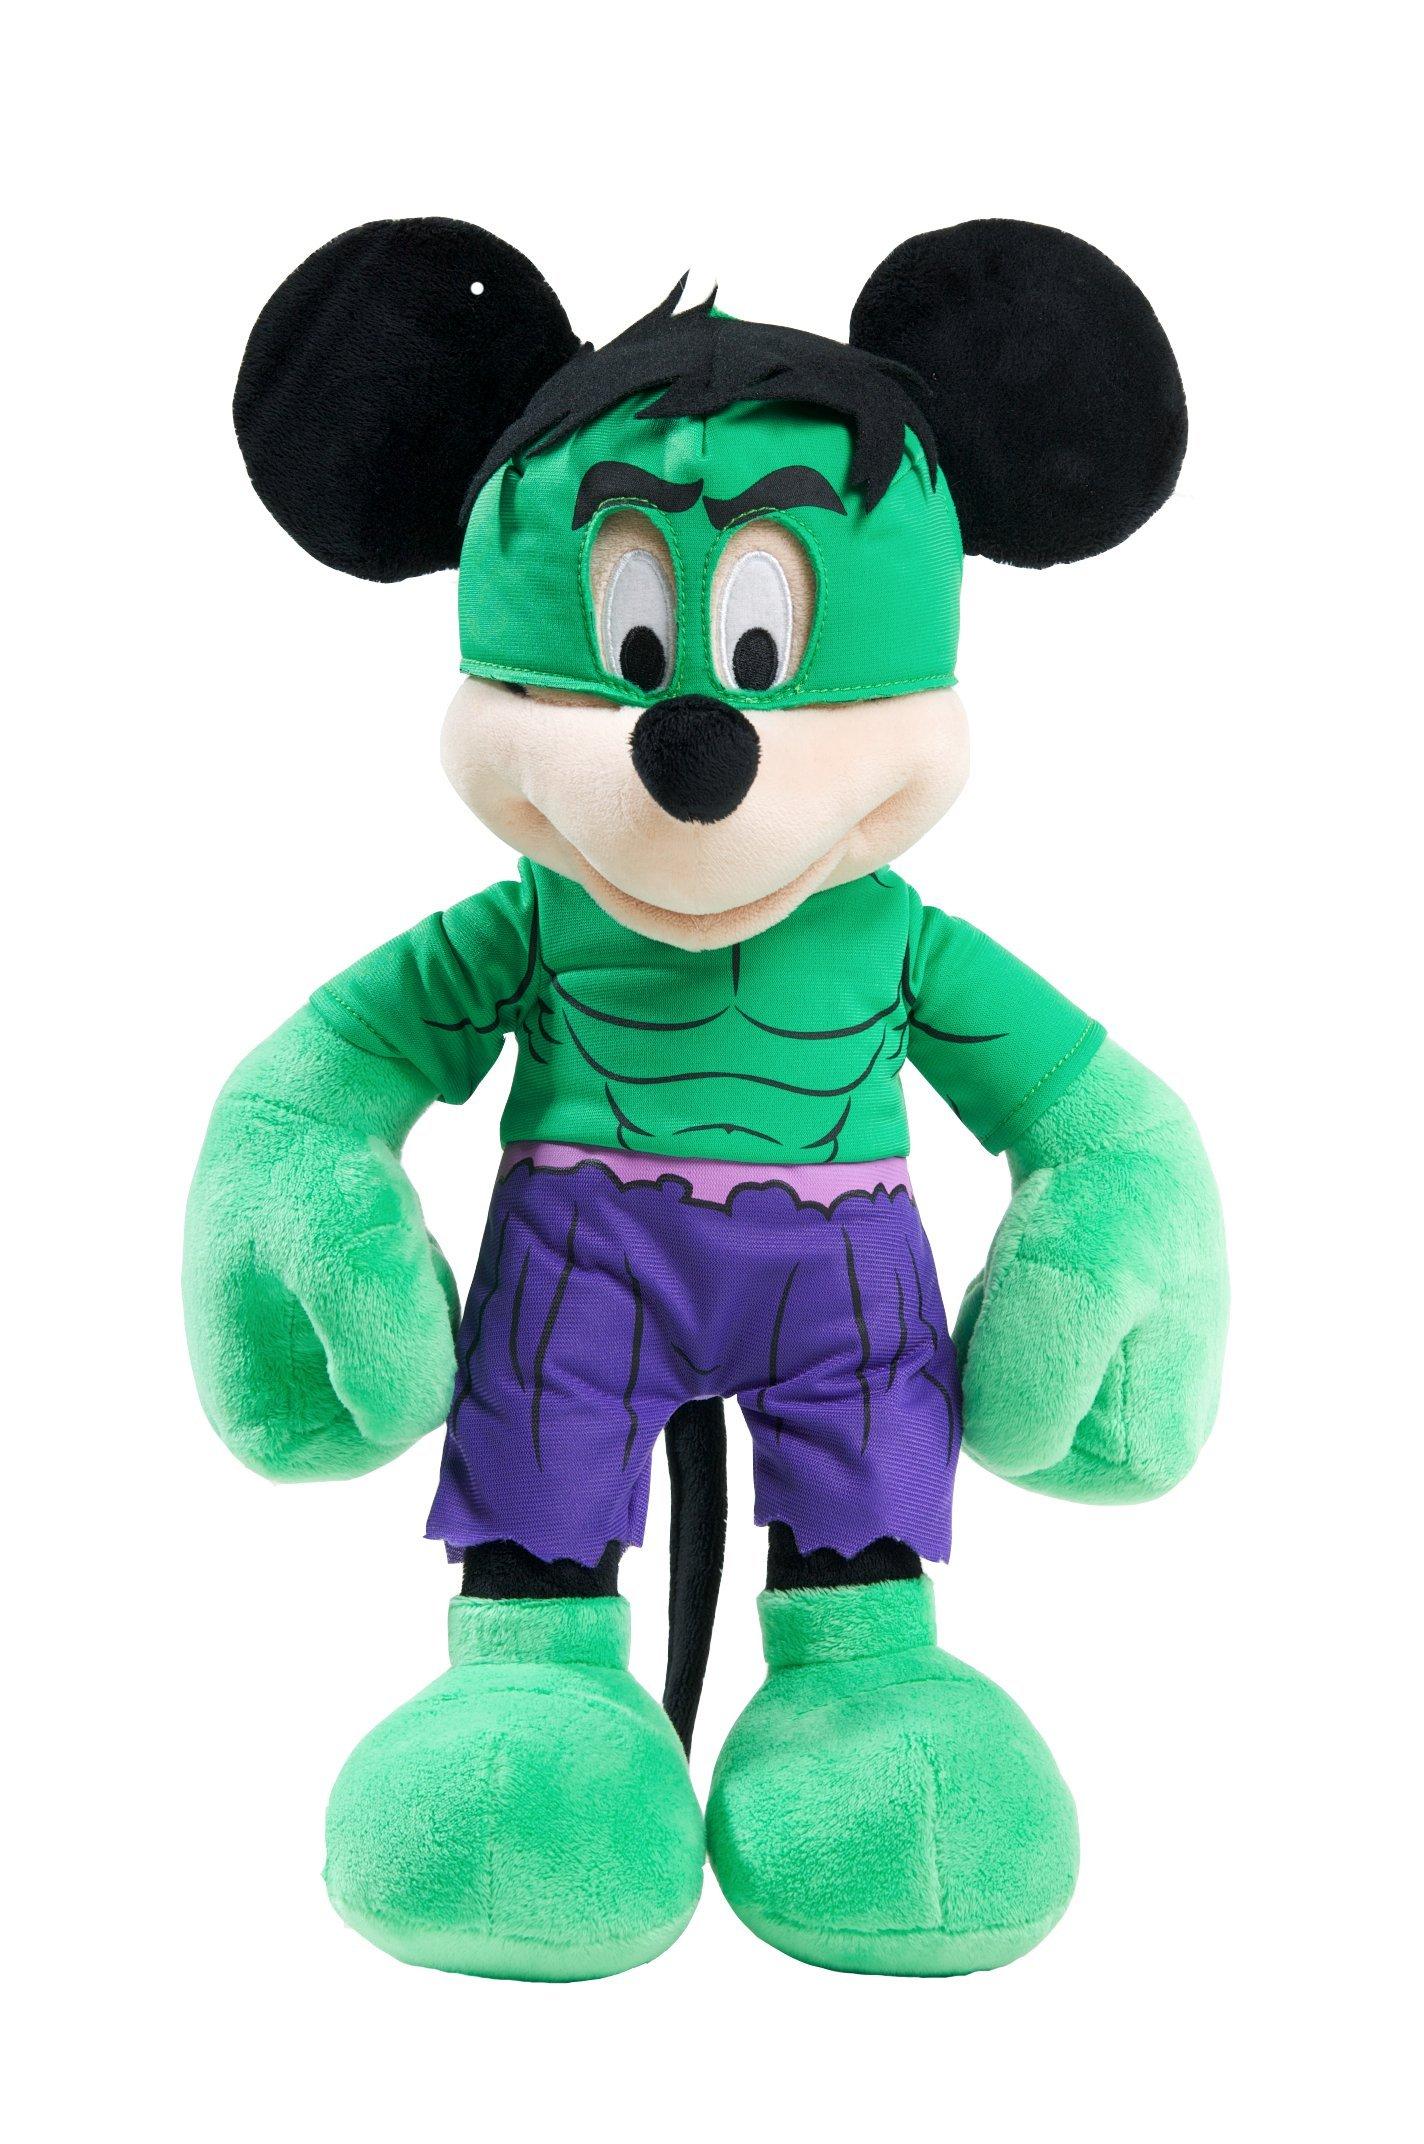 Marvel Disney Themed Mickey as Hulk Plush by Just Play